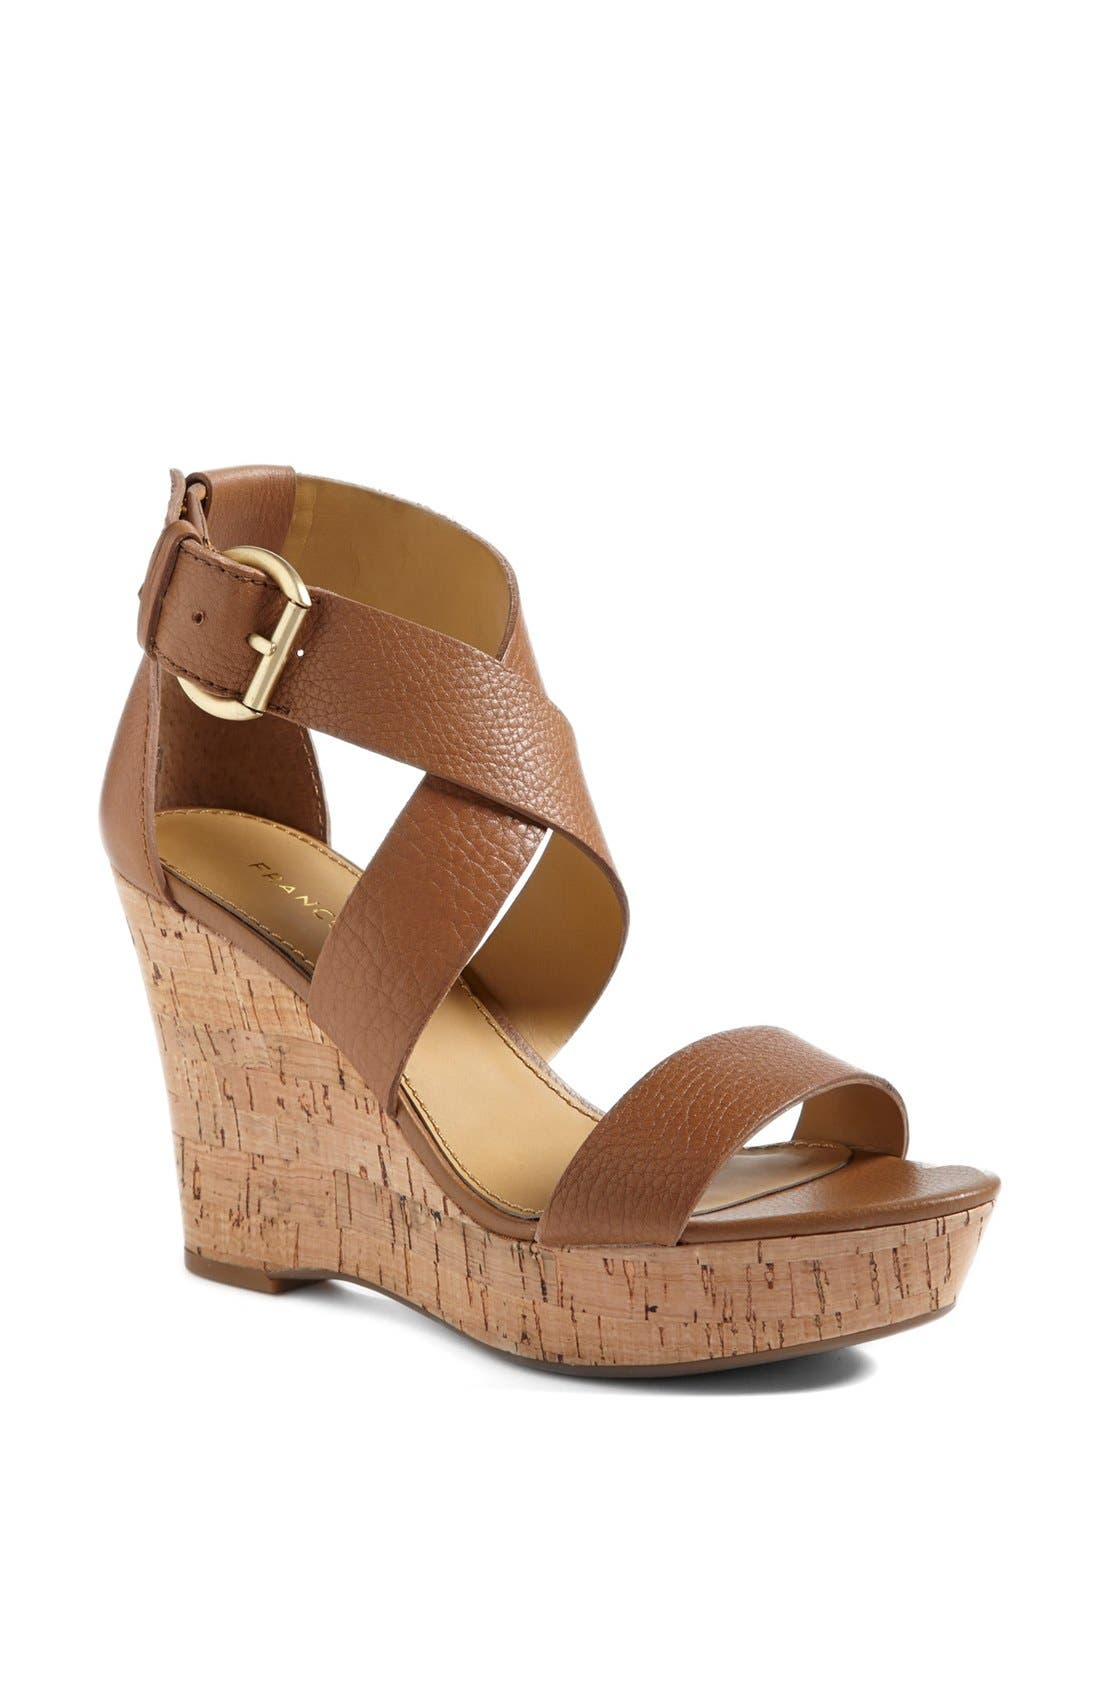 Alternate Image 1 Selected - Franco Sarto 'Sitar' Sandal